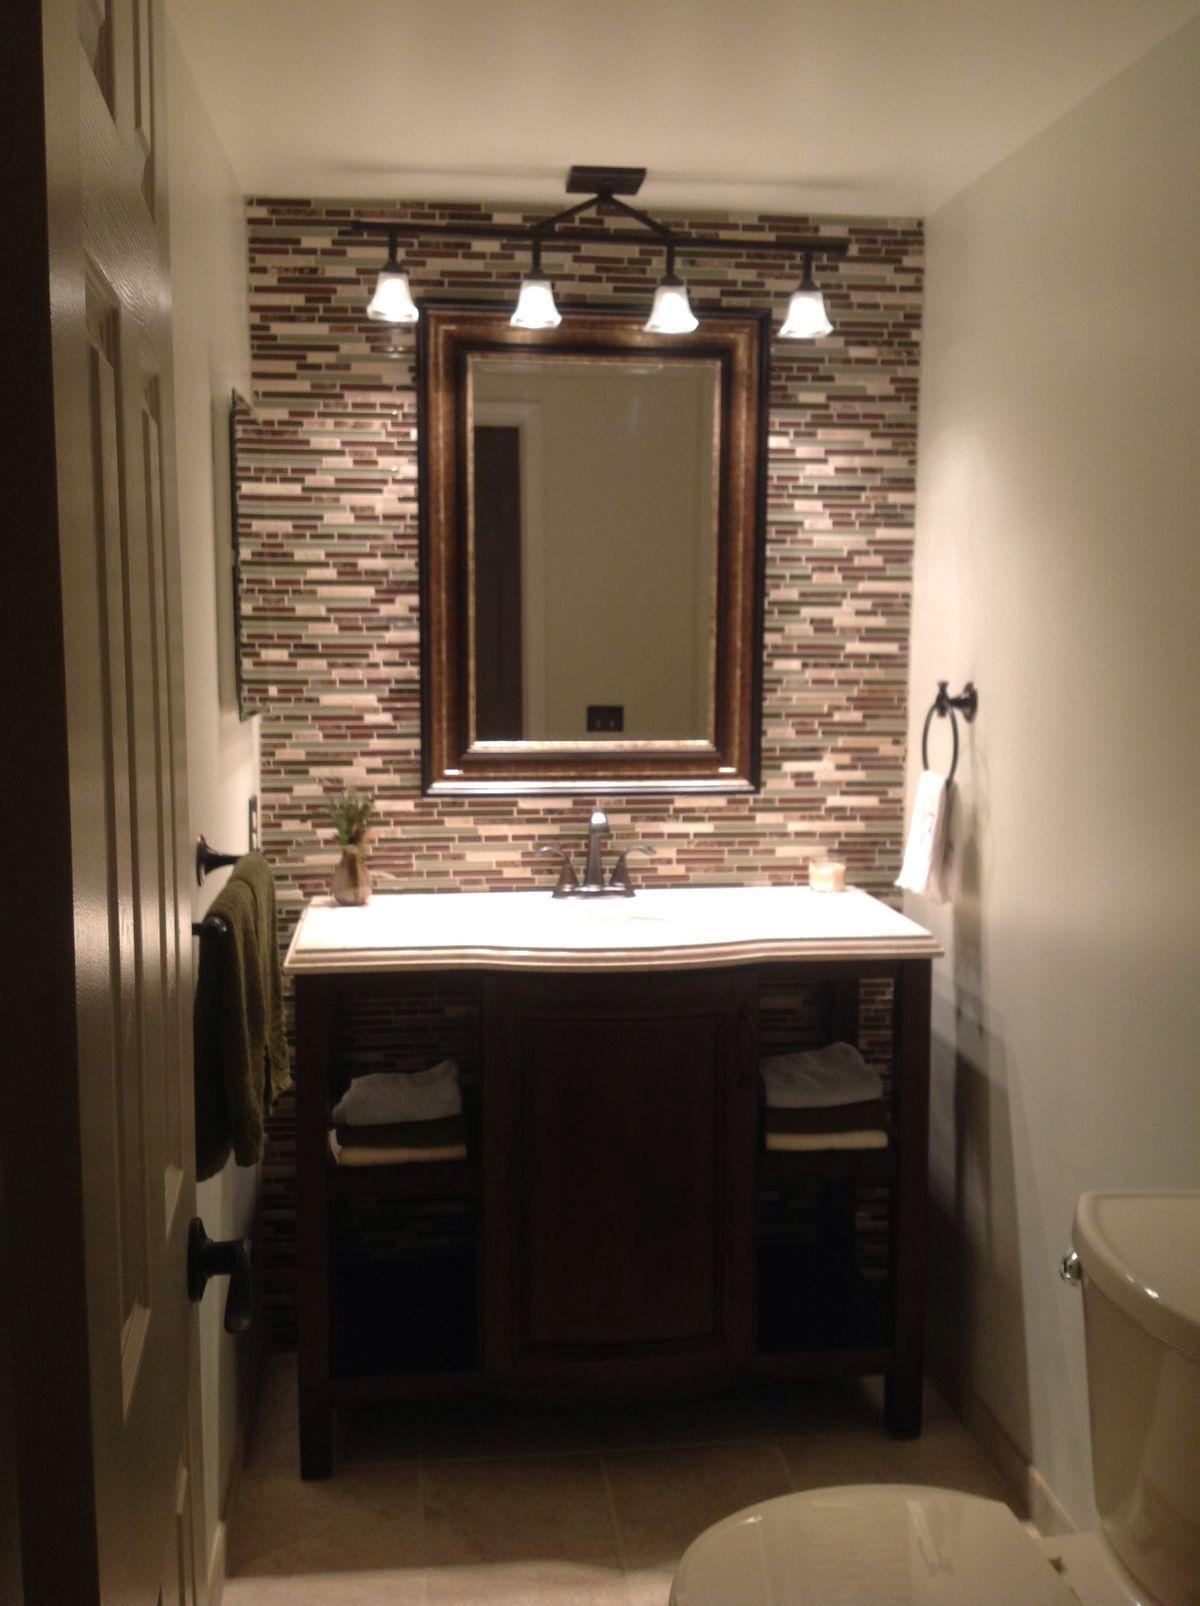 23 amazing half bathroom ideas to jazz up your half bath on amazing small bathroom designs and ideas id=50252